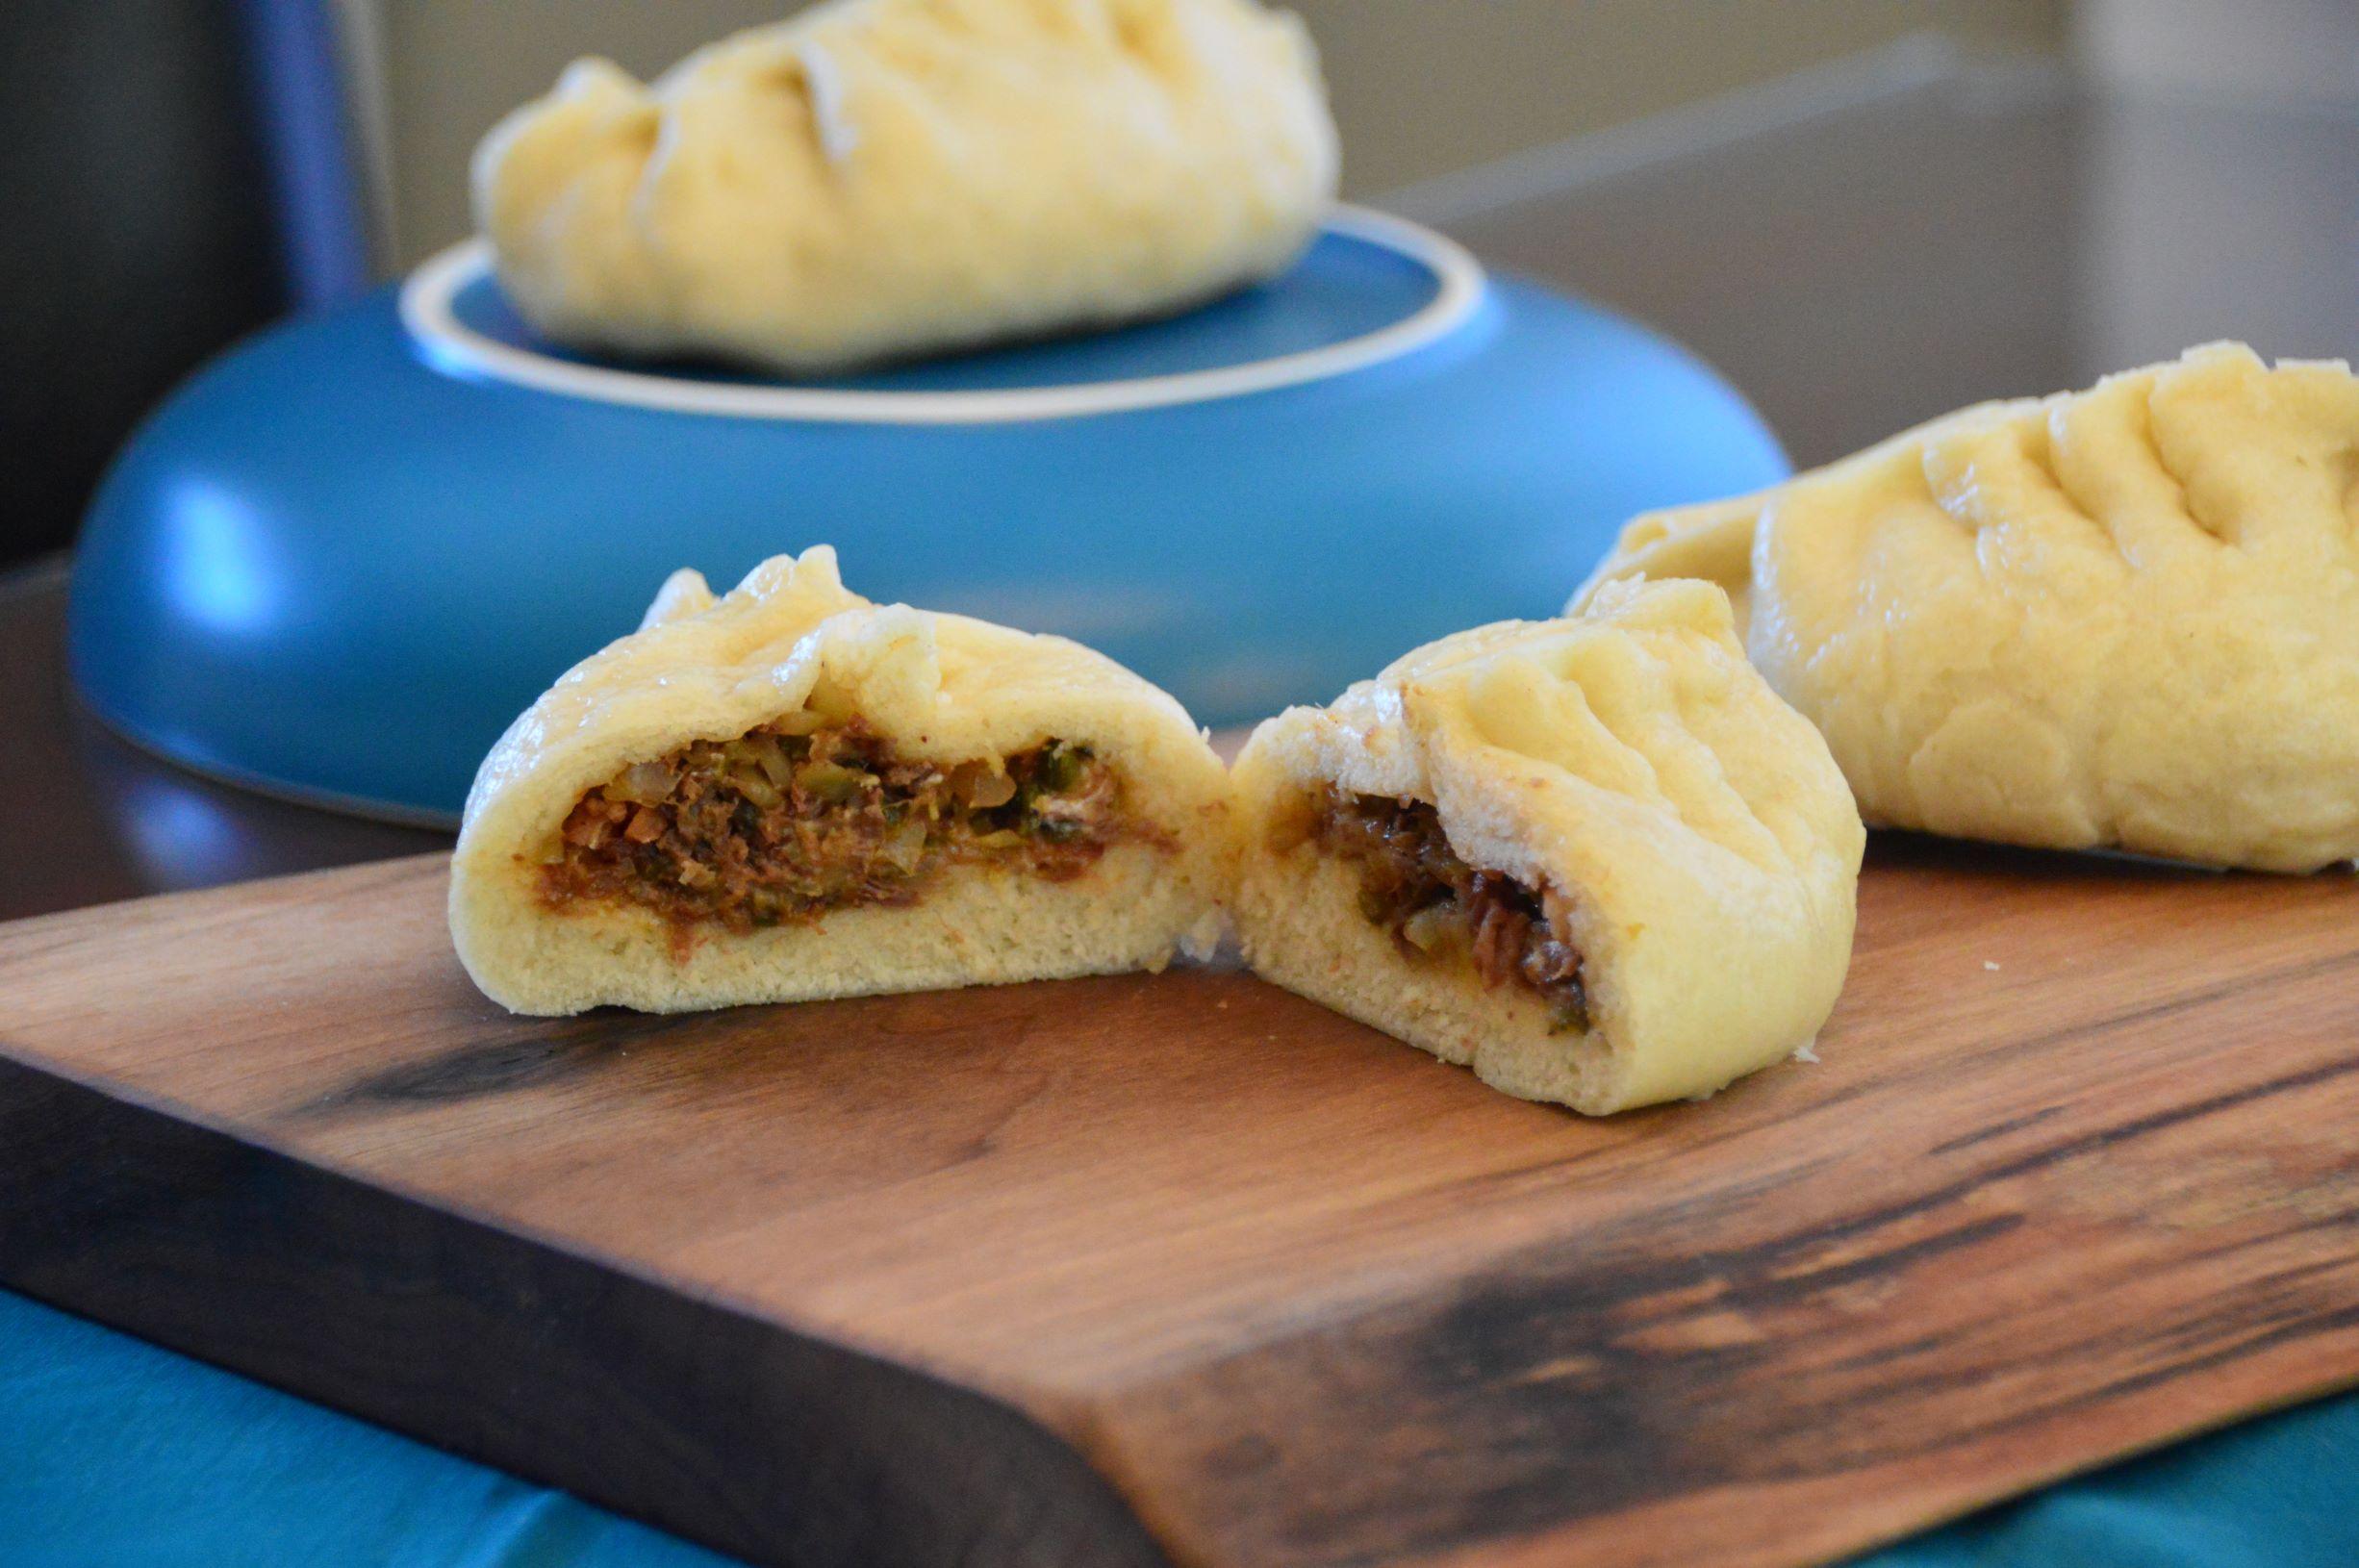 Texas Twinkie Steamed Bao